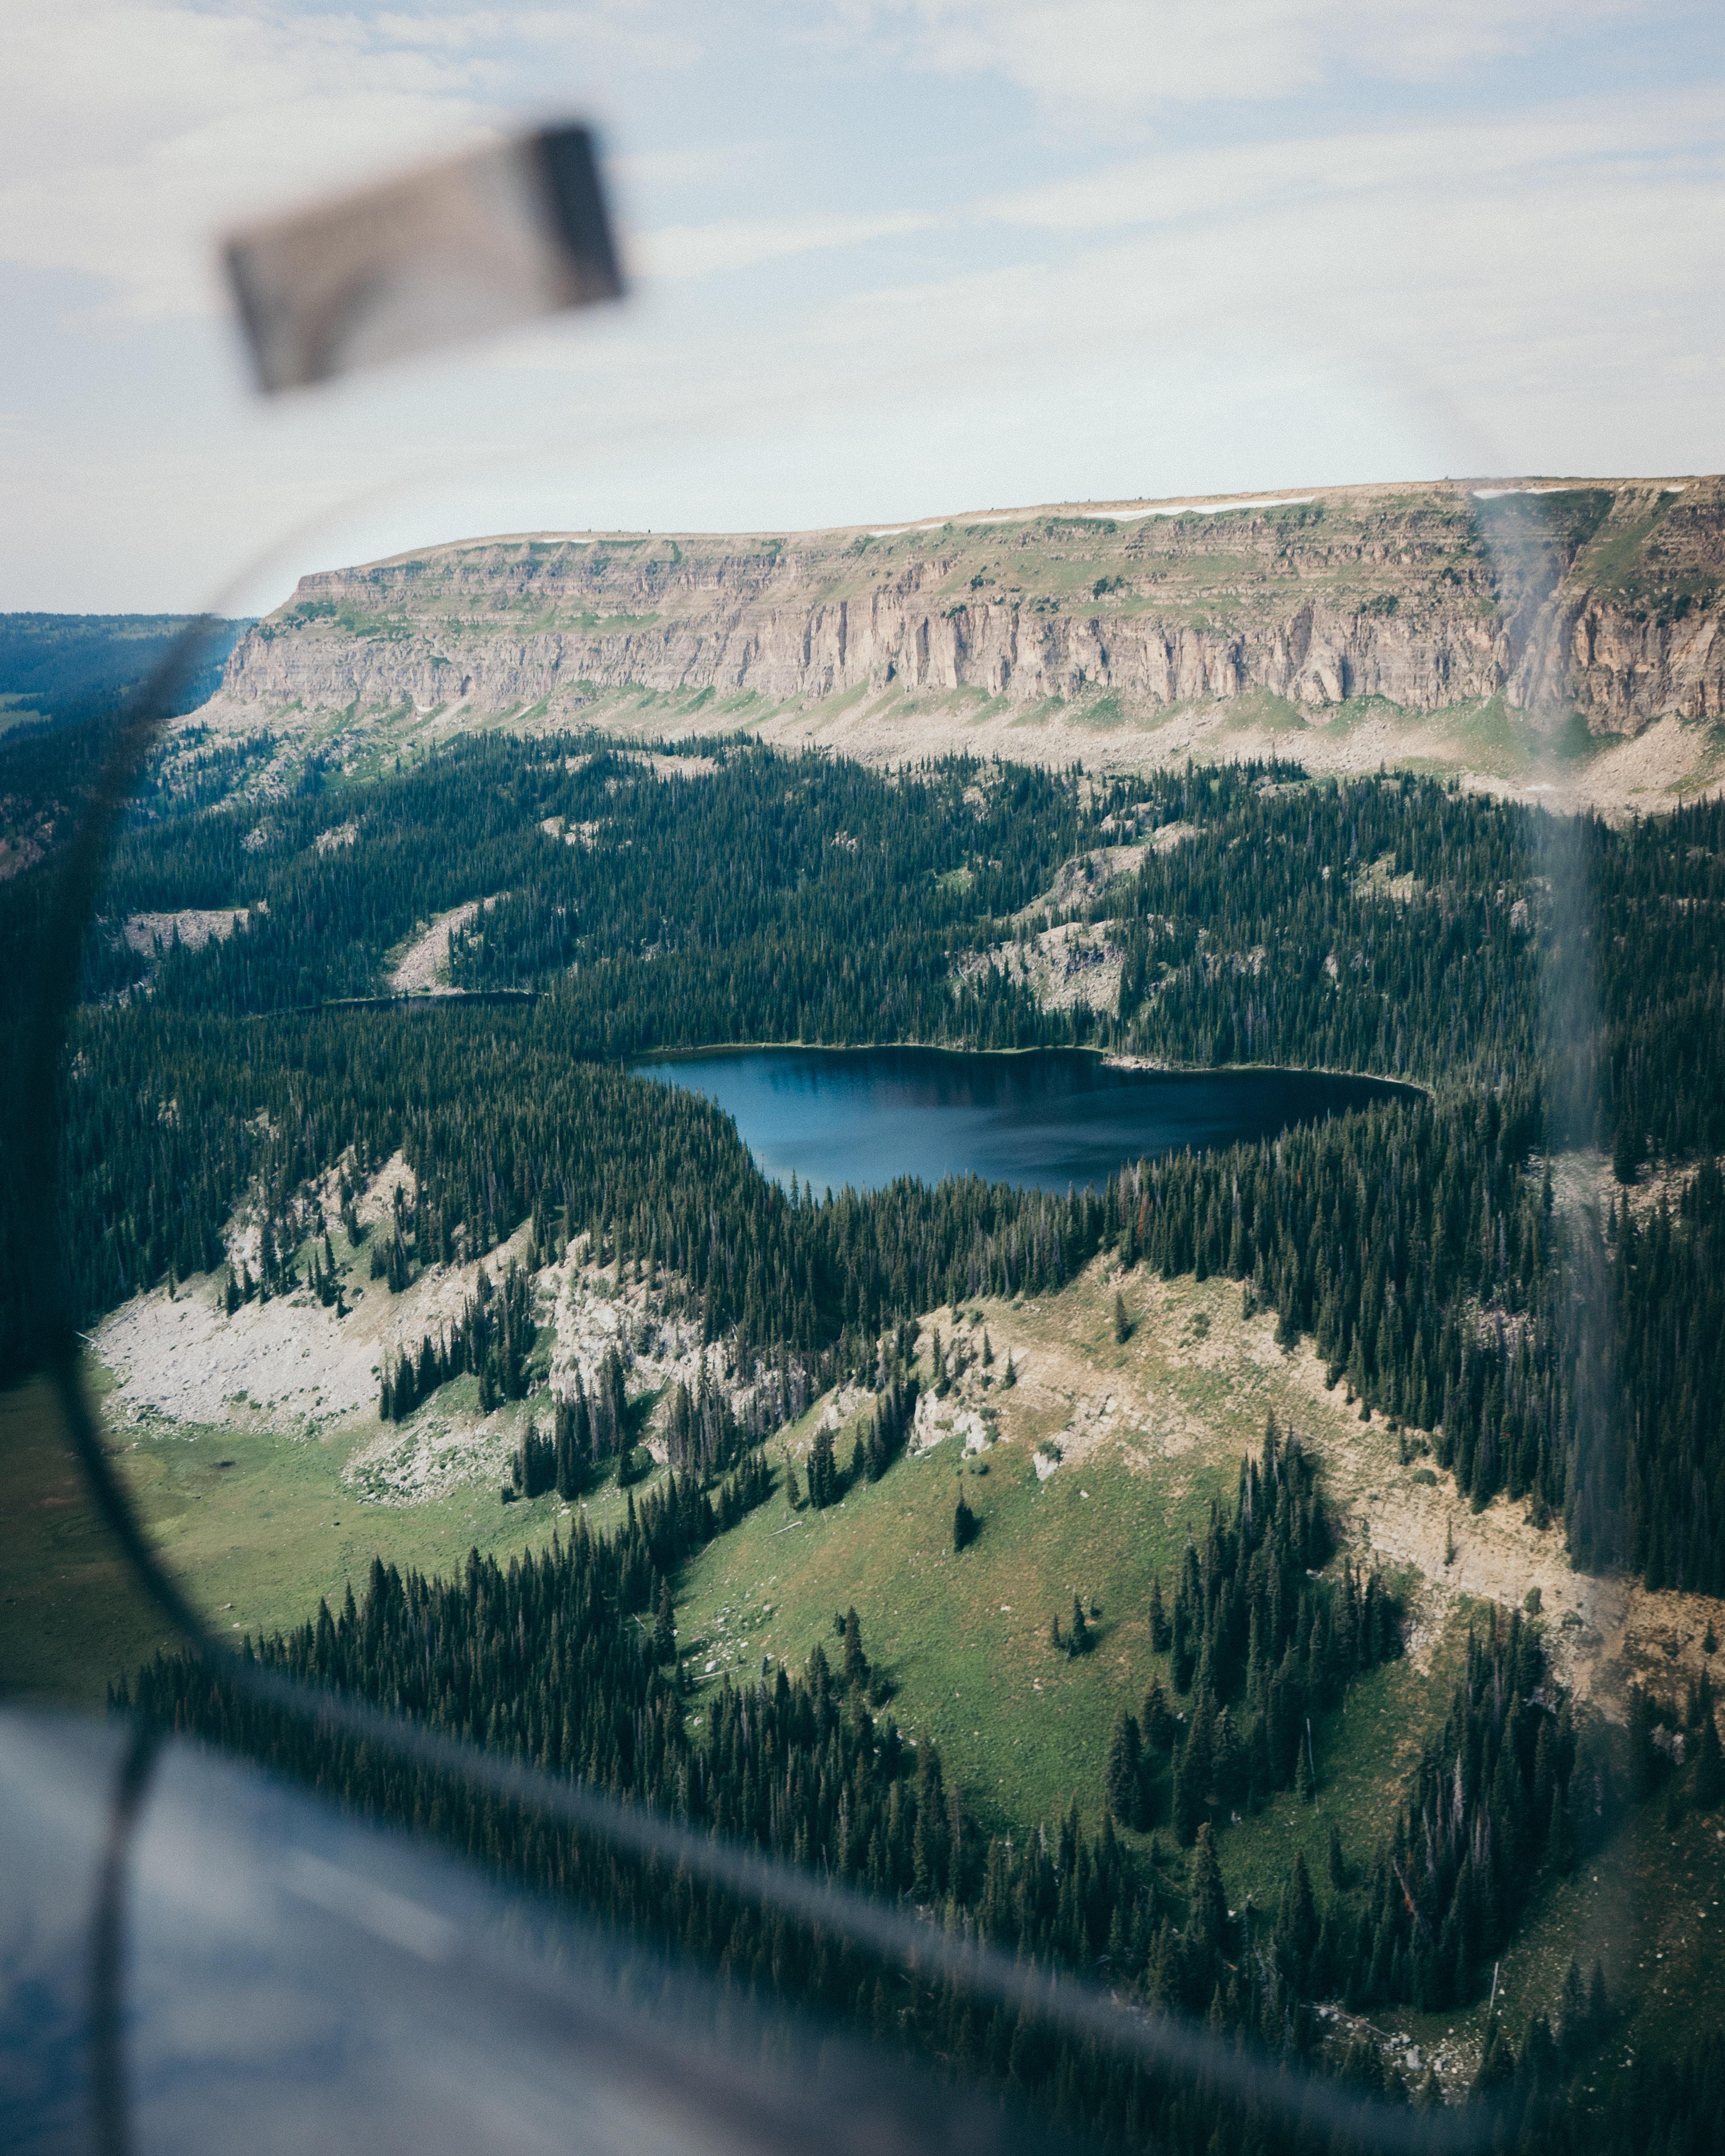 A high view of a tree-lined lake near a mountain plateau